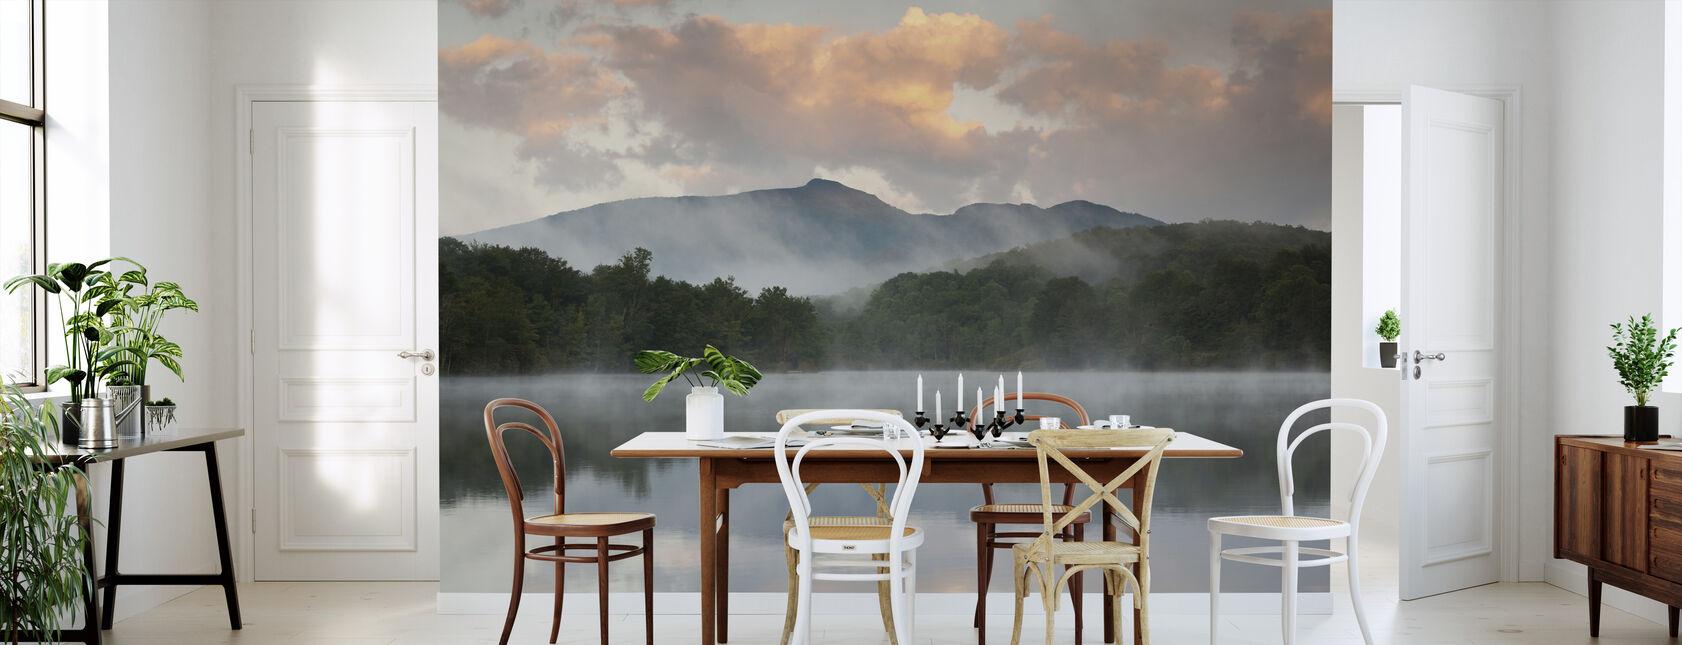 Mountain Lake Reflection of Blue Ridge - Wallpaper - Kitchen